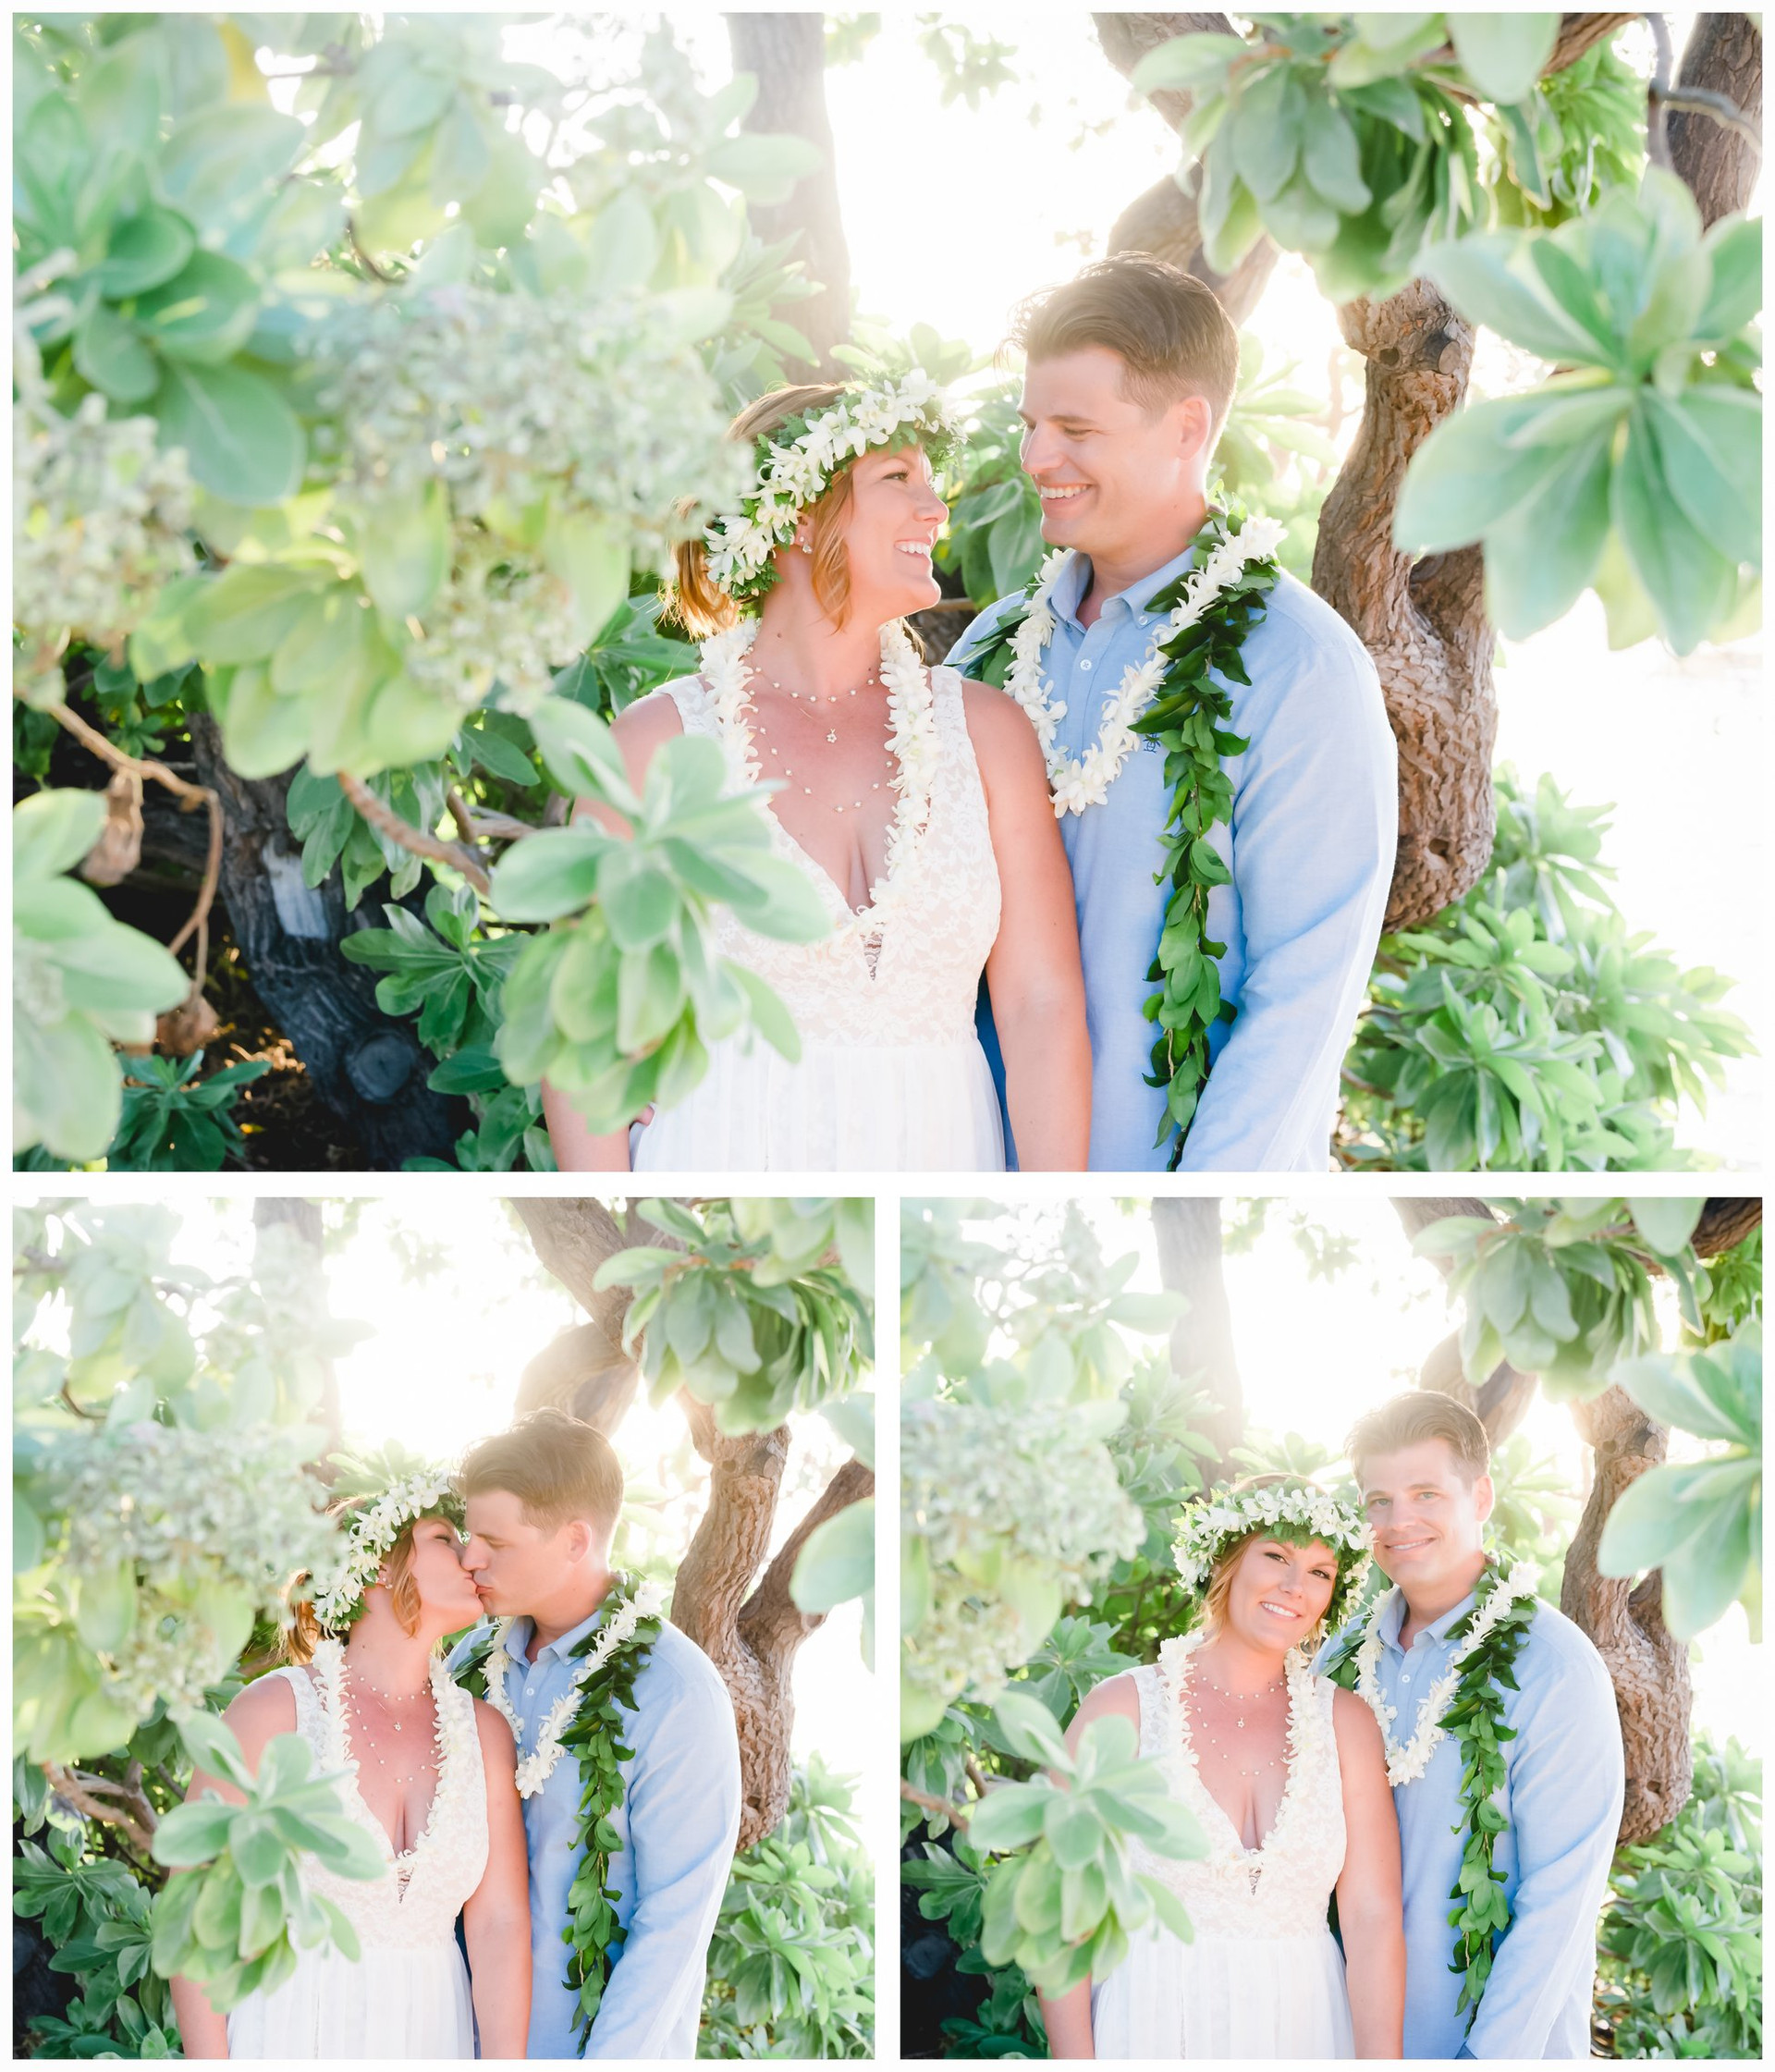 Hawaii Beach Weddings-4-2.jpg